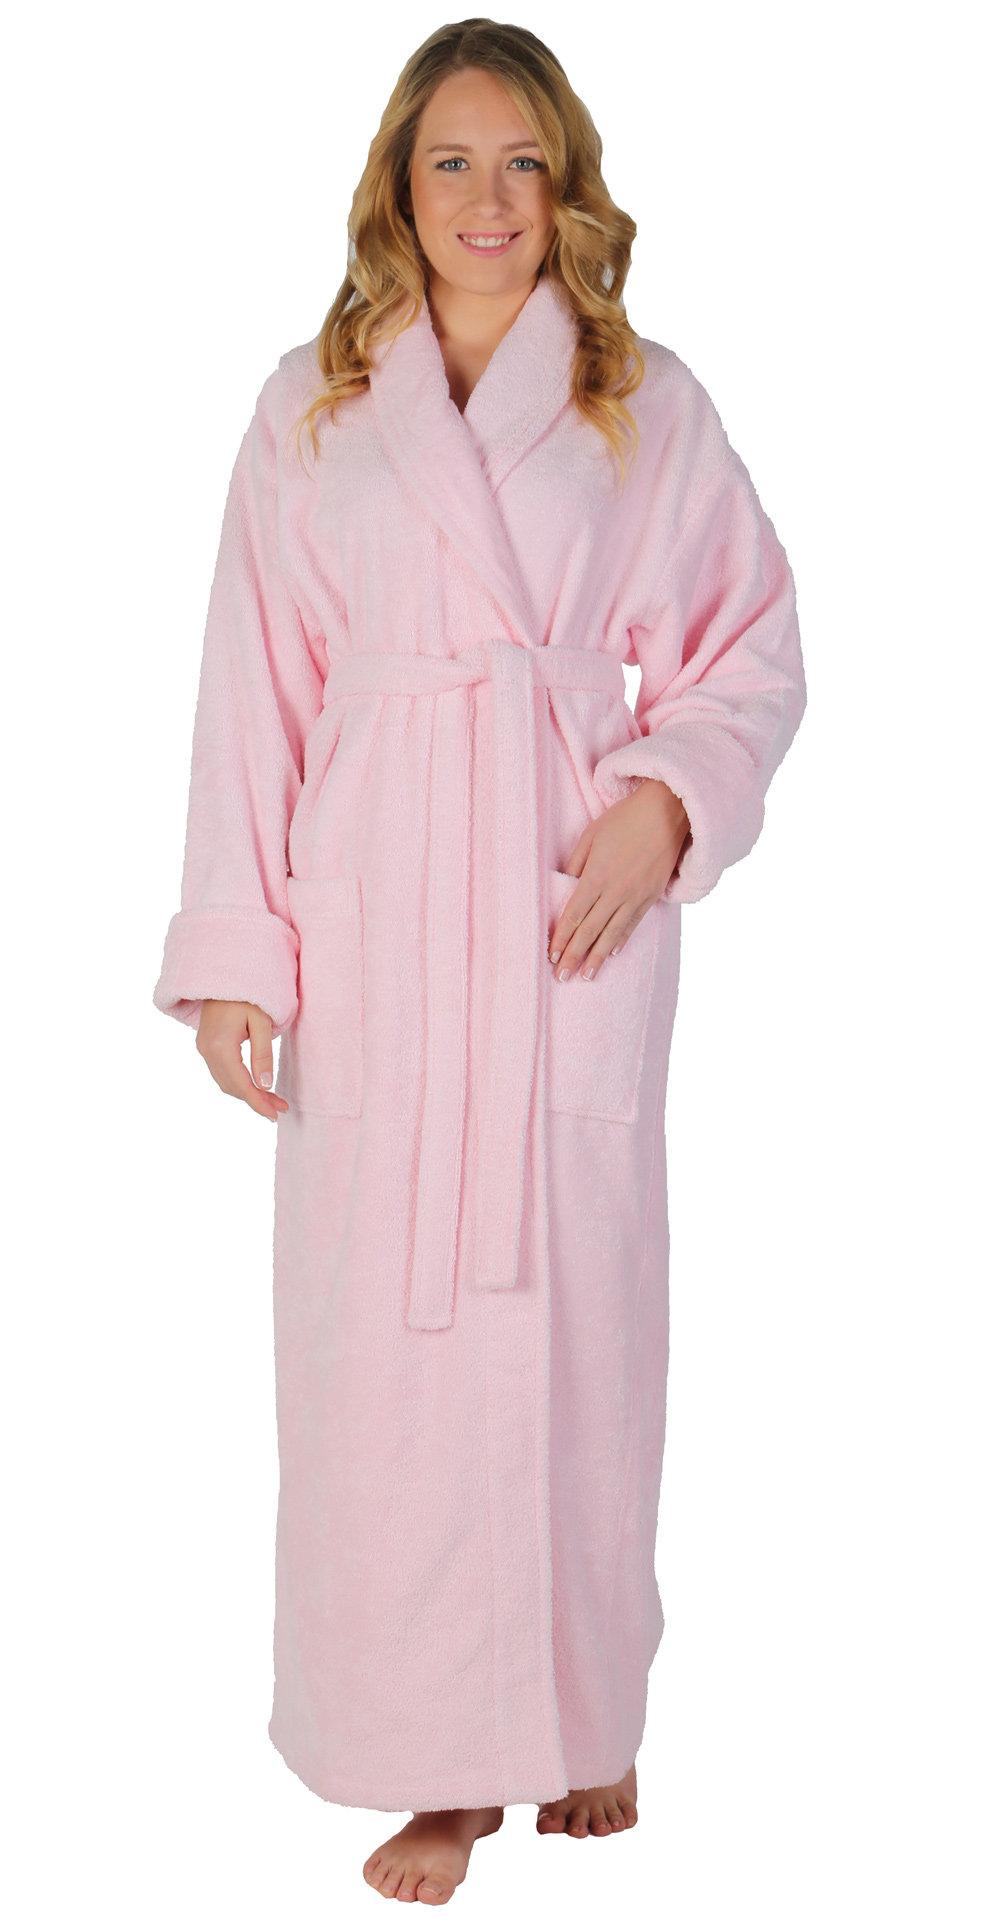 Winston Porter Laurens Women s Optimal Shawl Collar 100% Cotton Terry Cloth  Bathrobe  530b69014